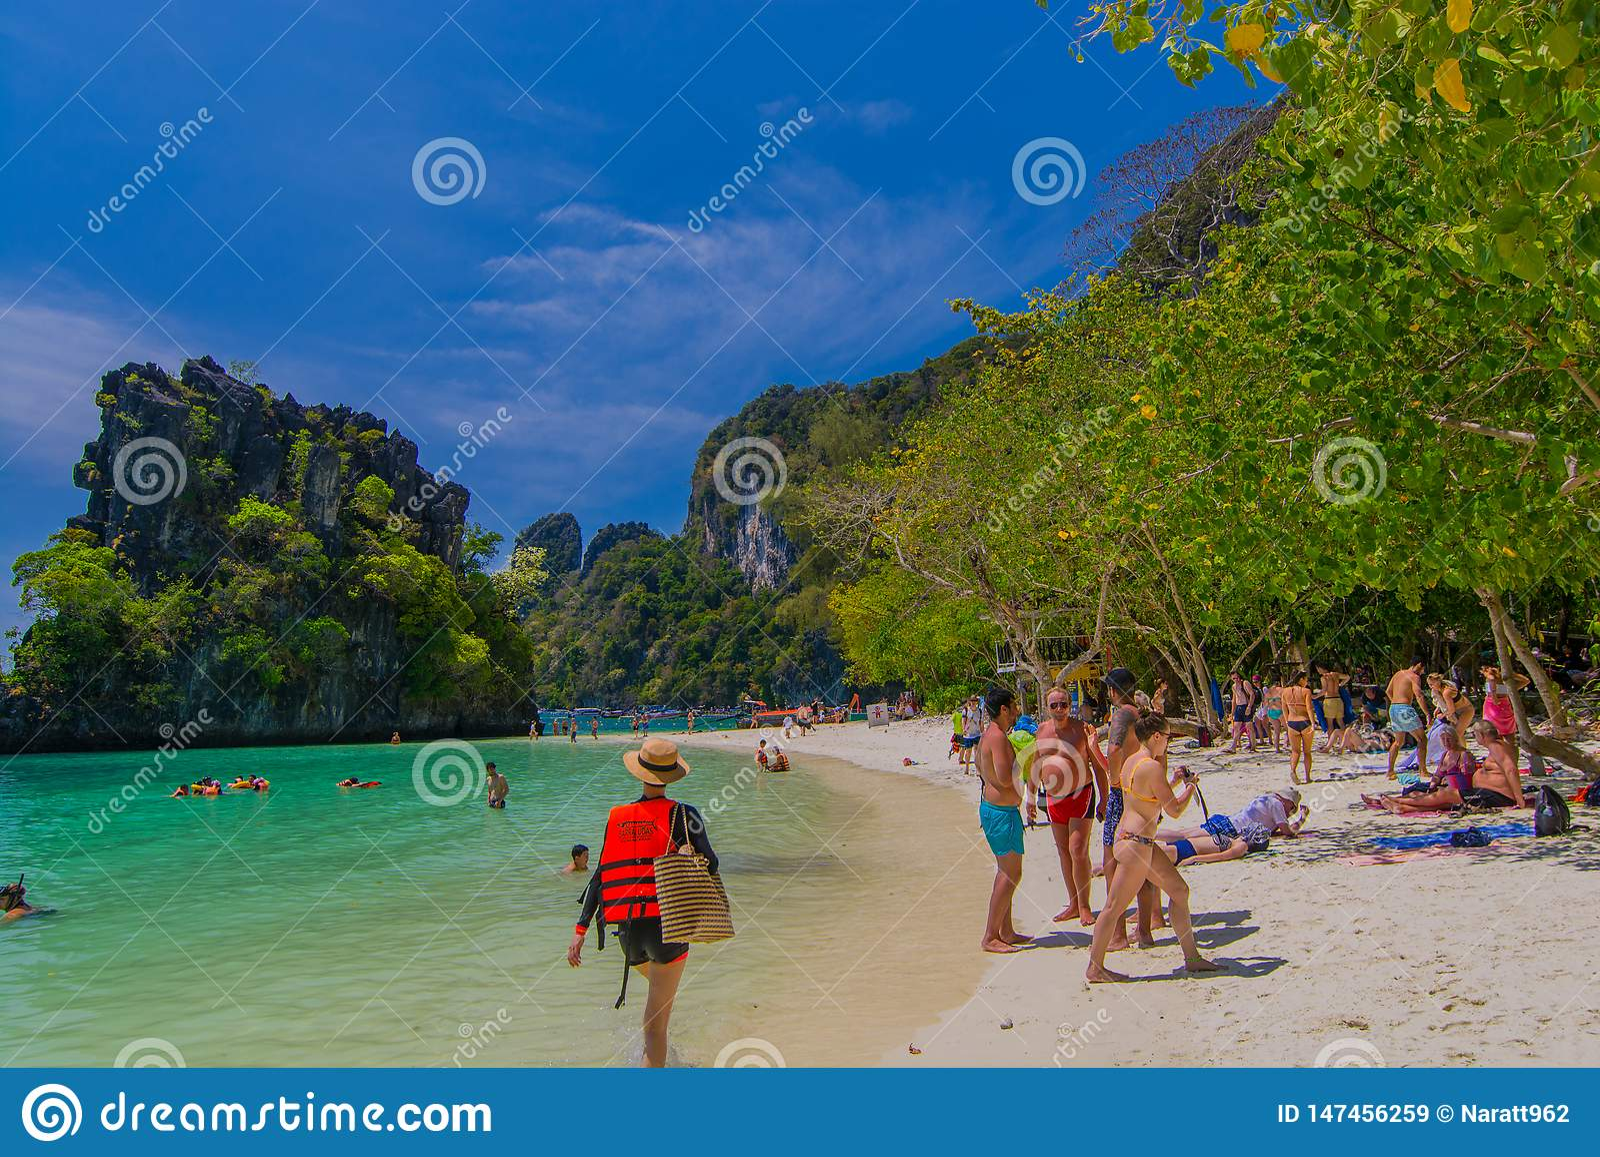 Krabi Thailand February 23 2019 Tourists Come To Relax